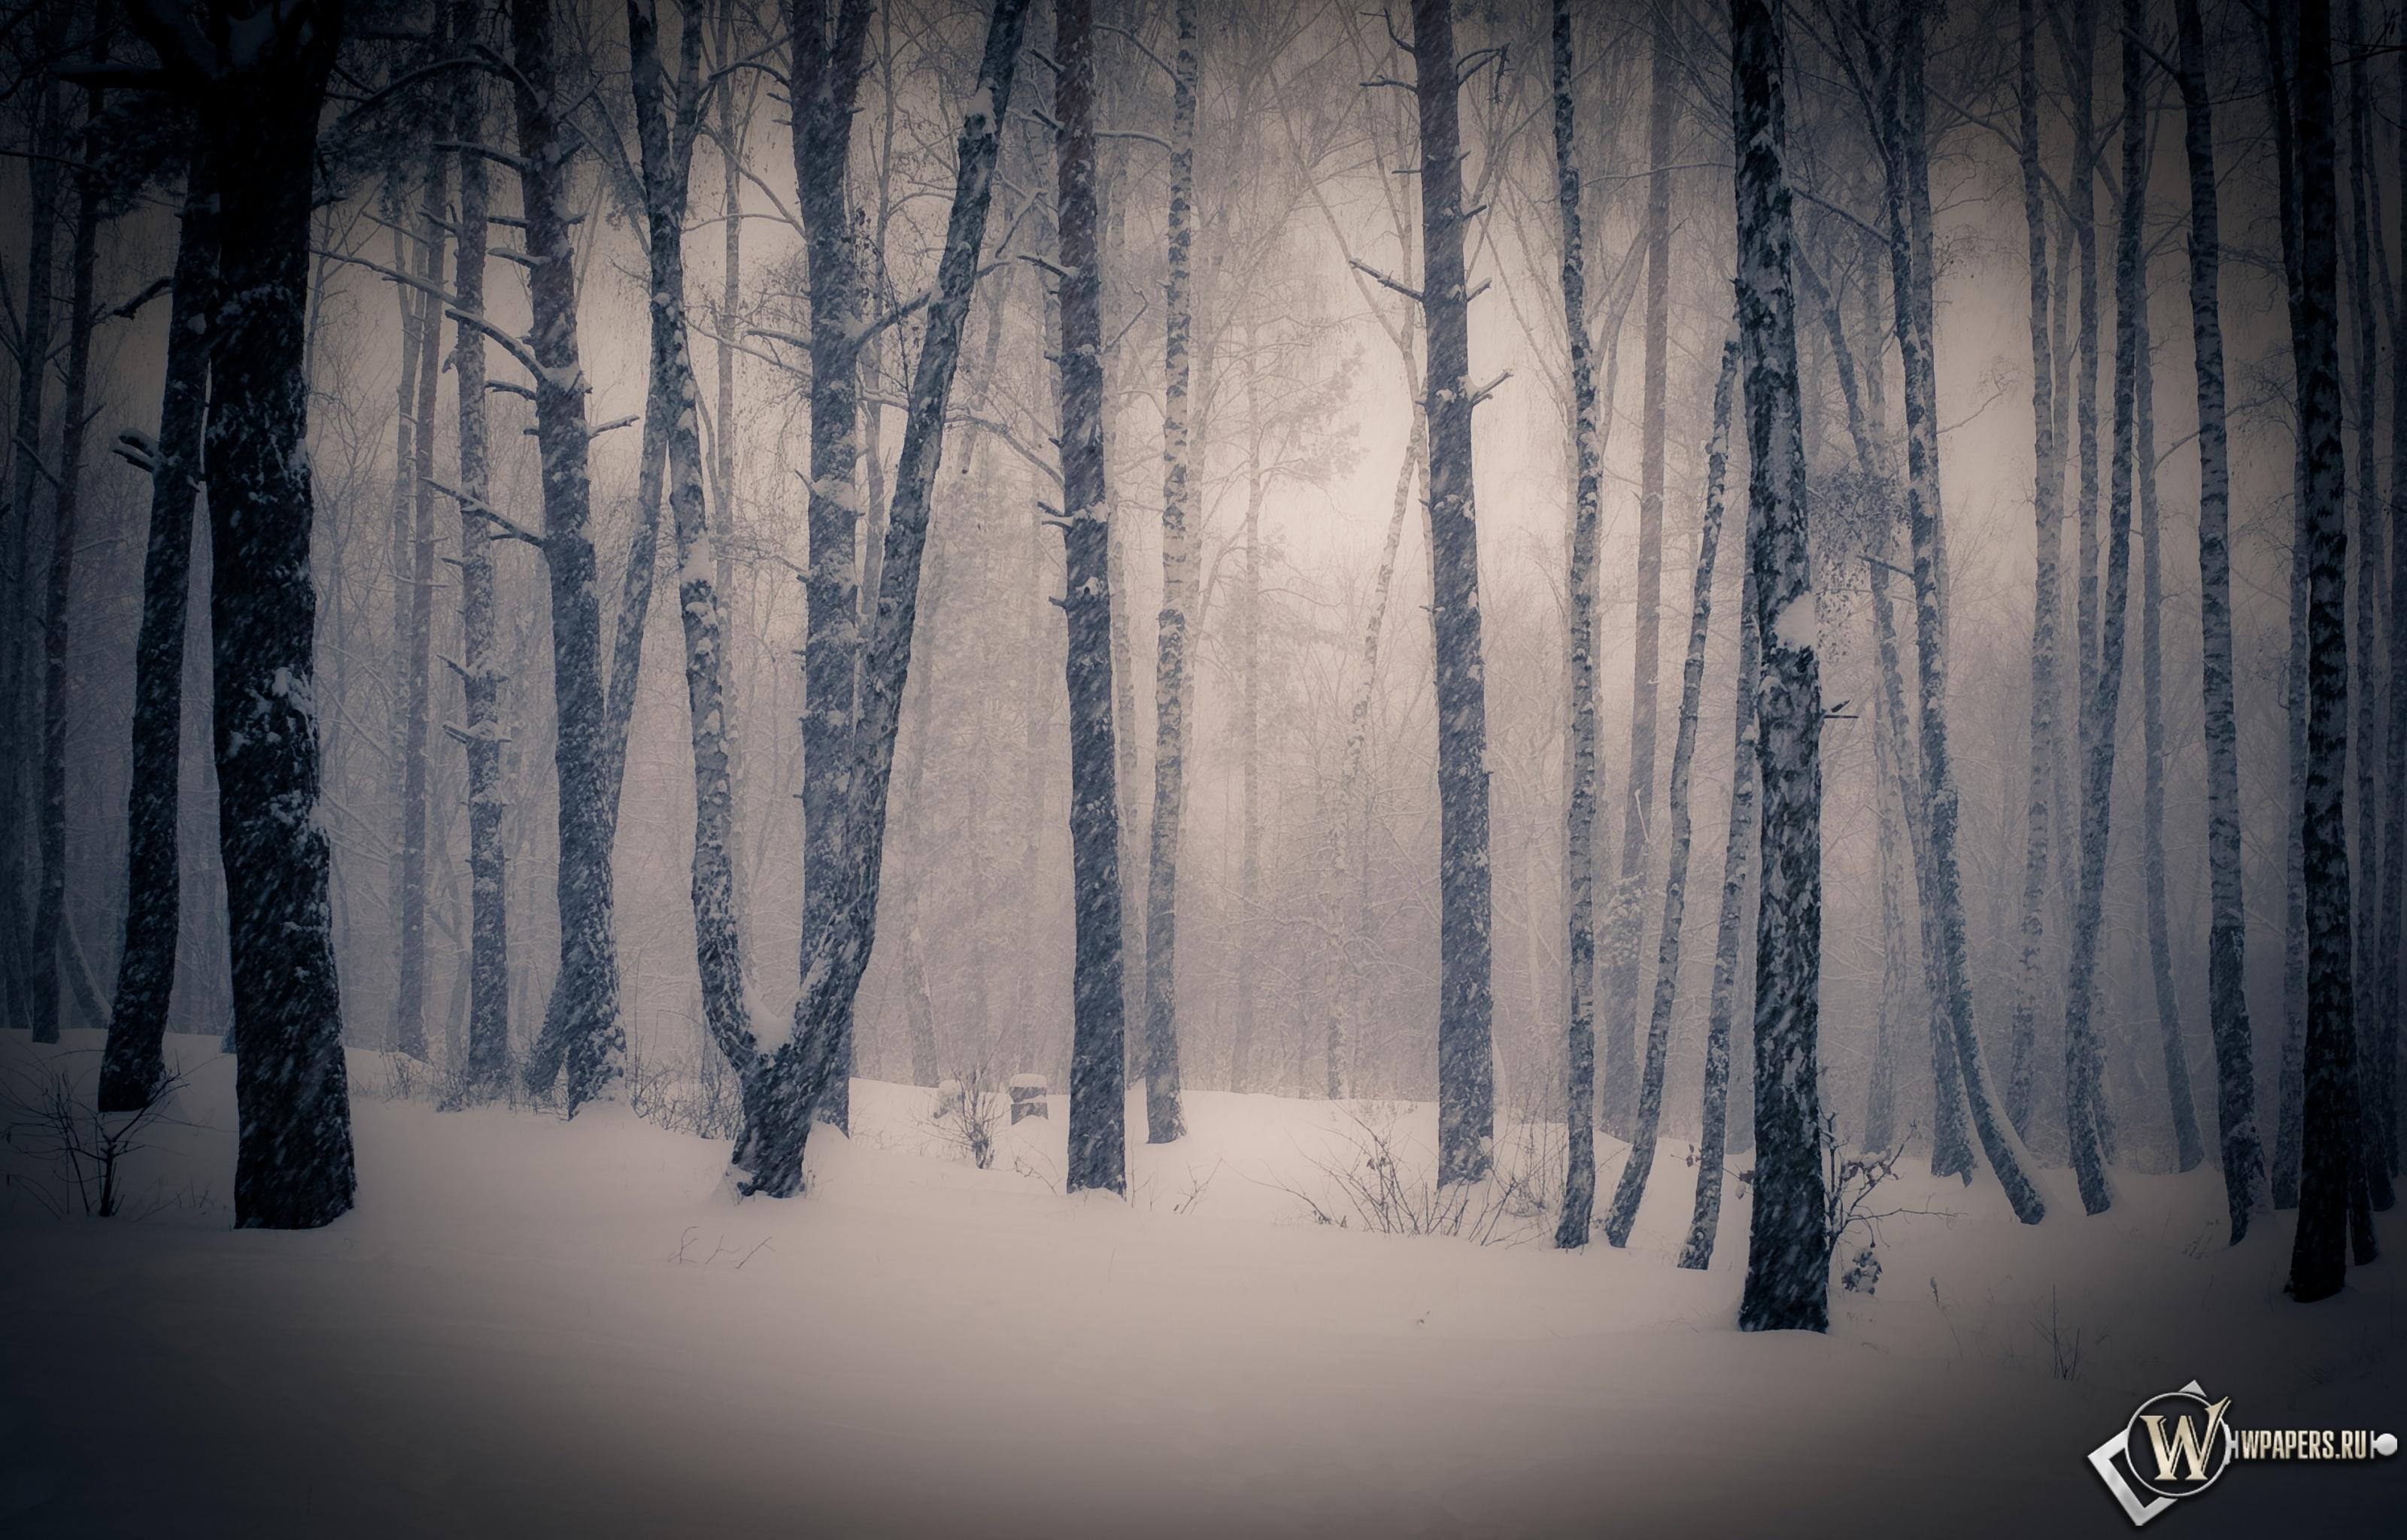 Тишина в зимнем лесу 3200x2048